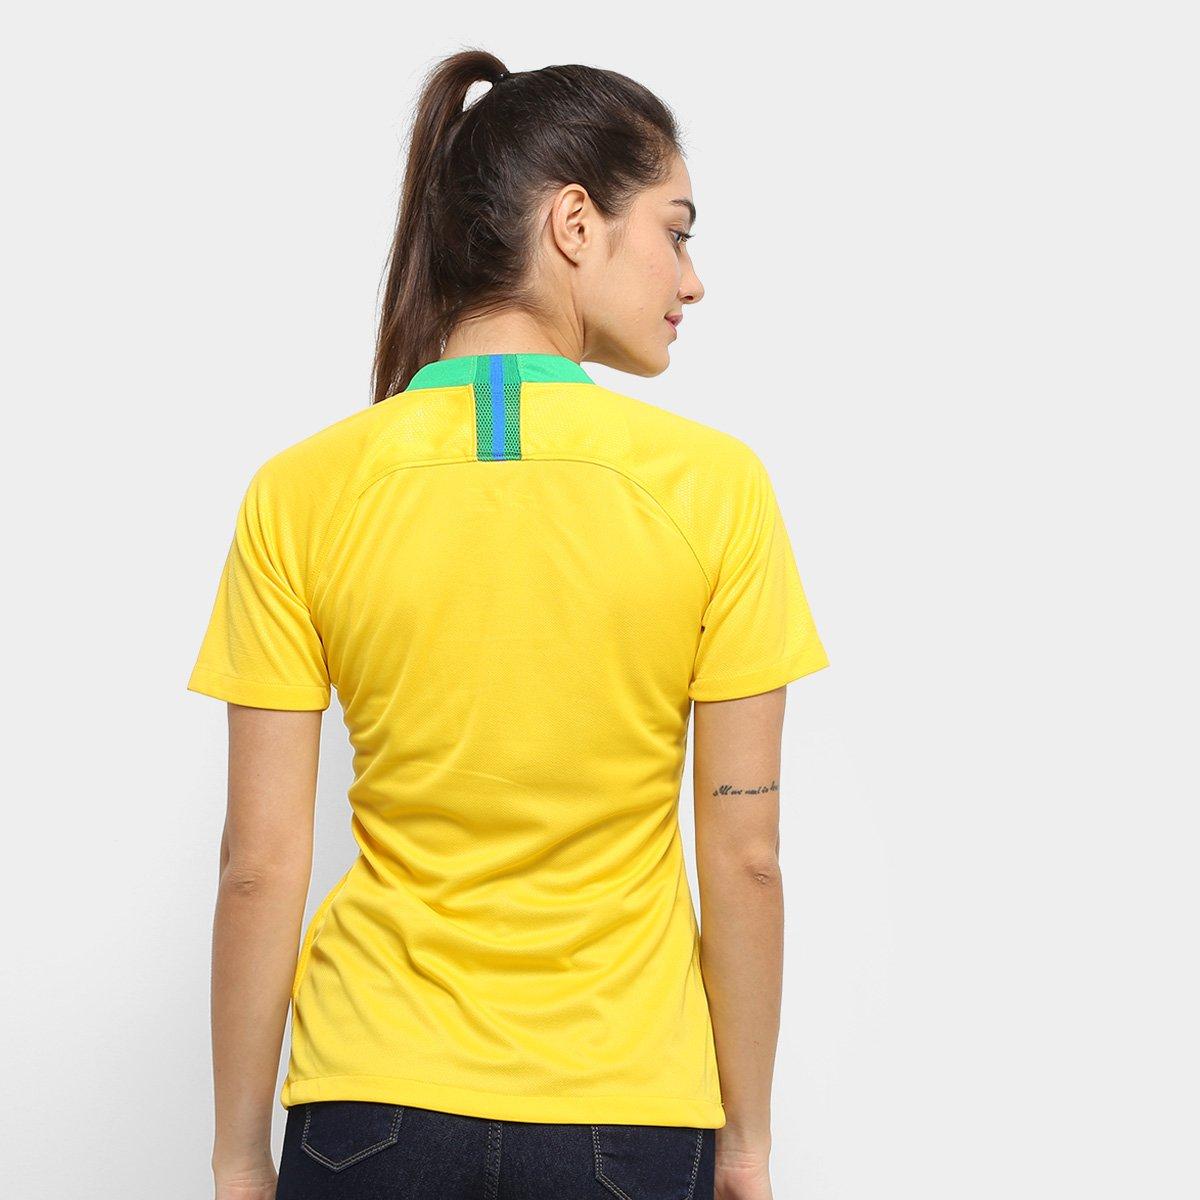 6c311f7ebb Camisa Seleção Brasil I 2018 s n° - Torcedor Nike Feminina - Amarelo ...